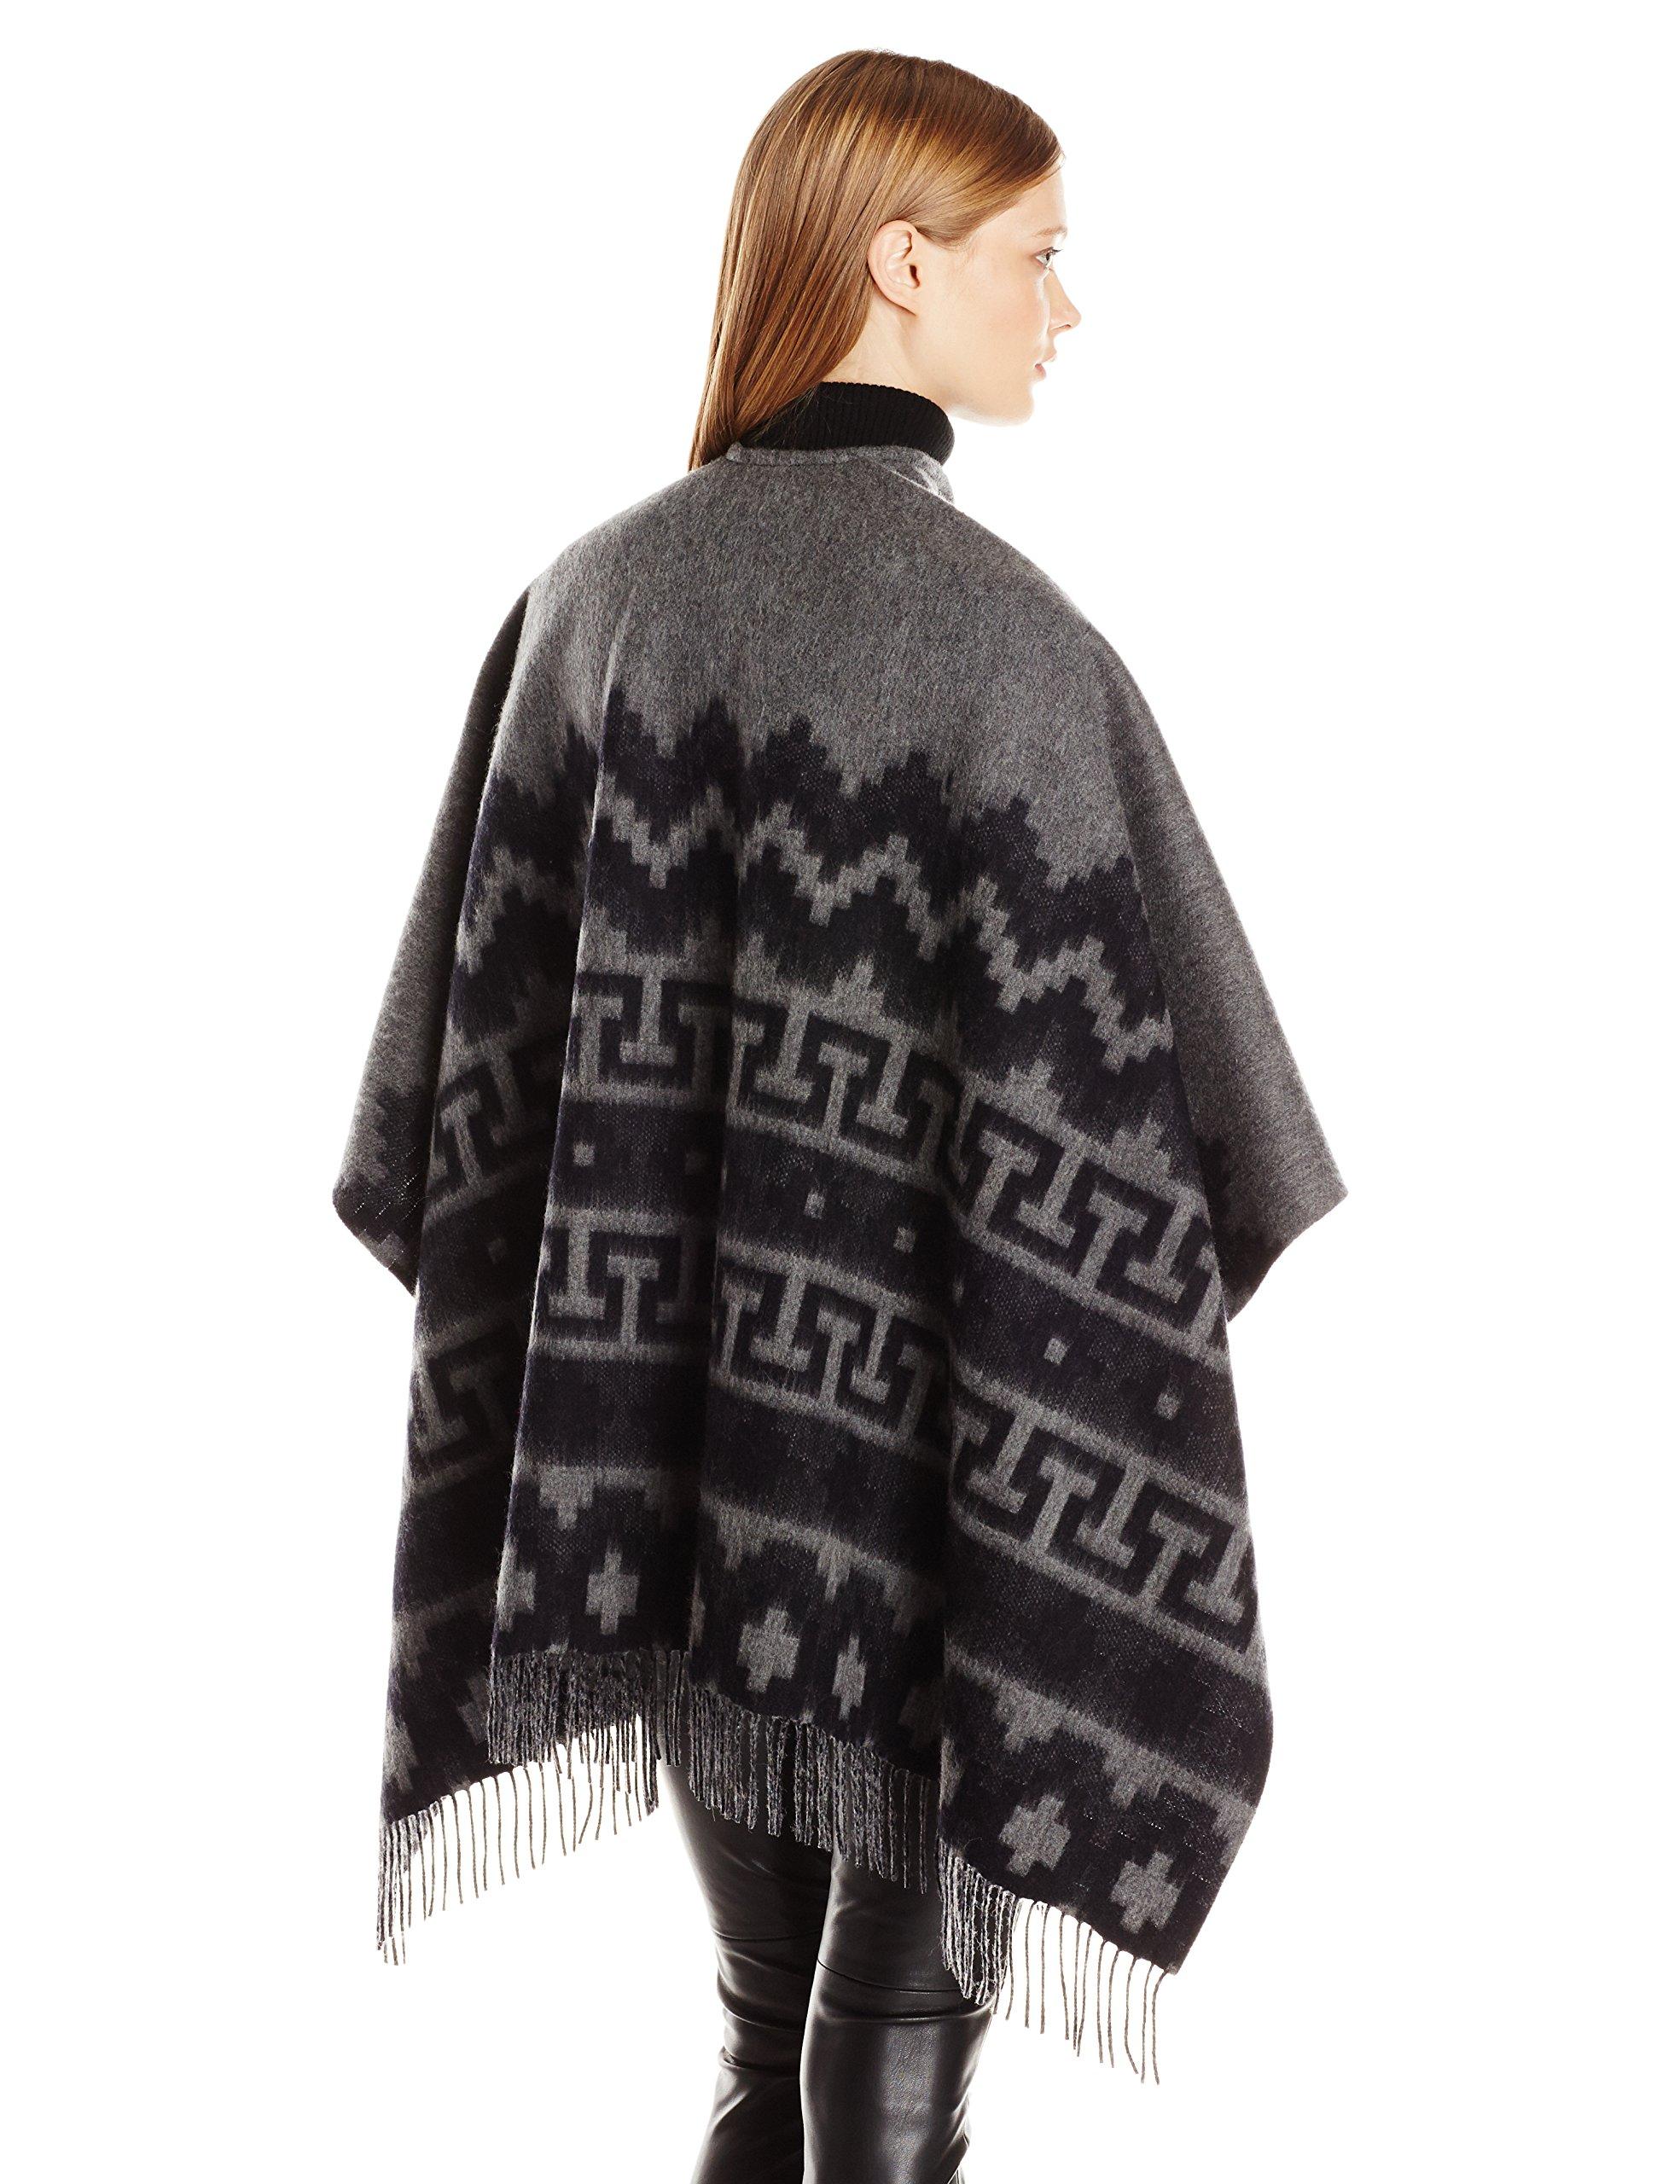 Phenix Cashmere Women's Aztec Merino Wool Jacquard Ruana, Derby Grey/Black, One Size by Phenix Cashmere (Image #2)